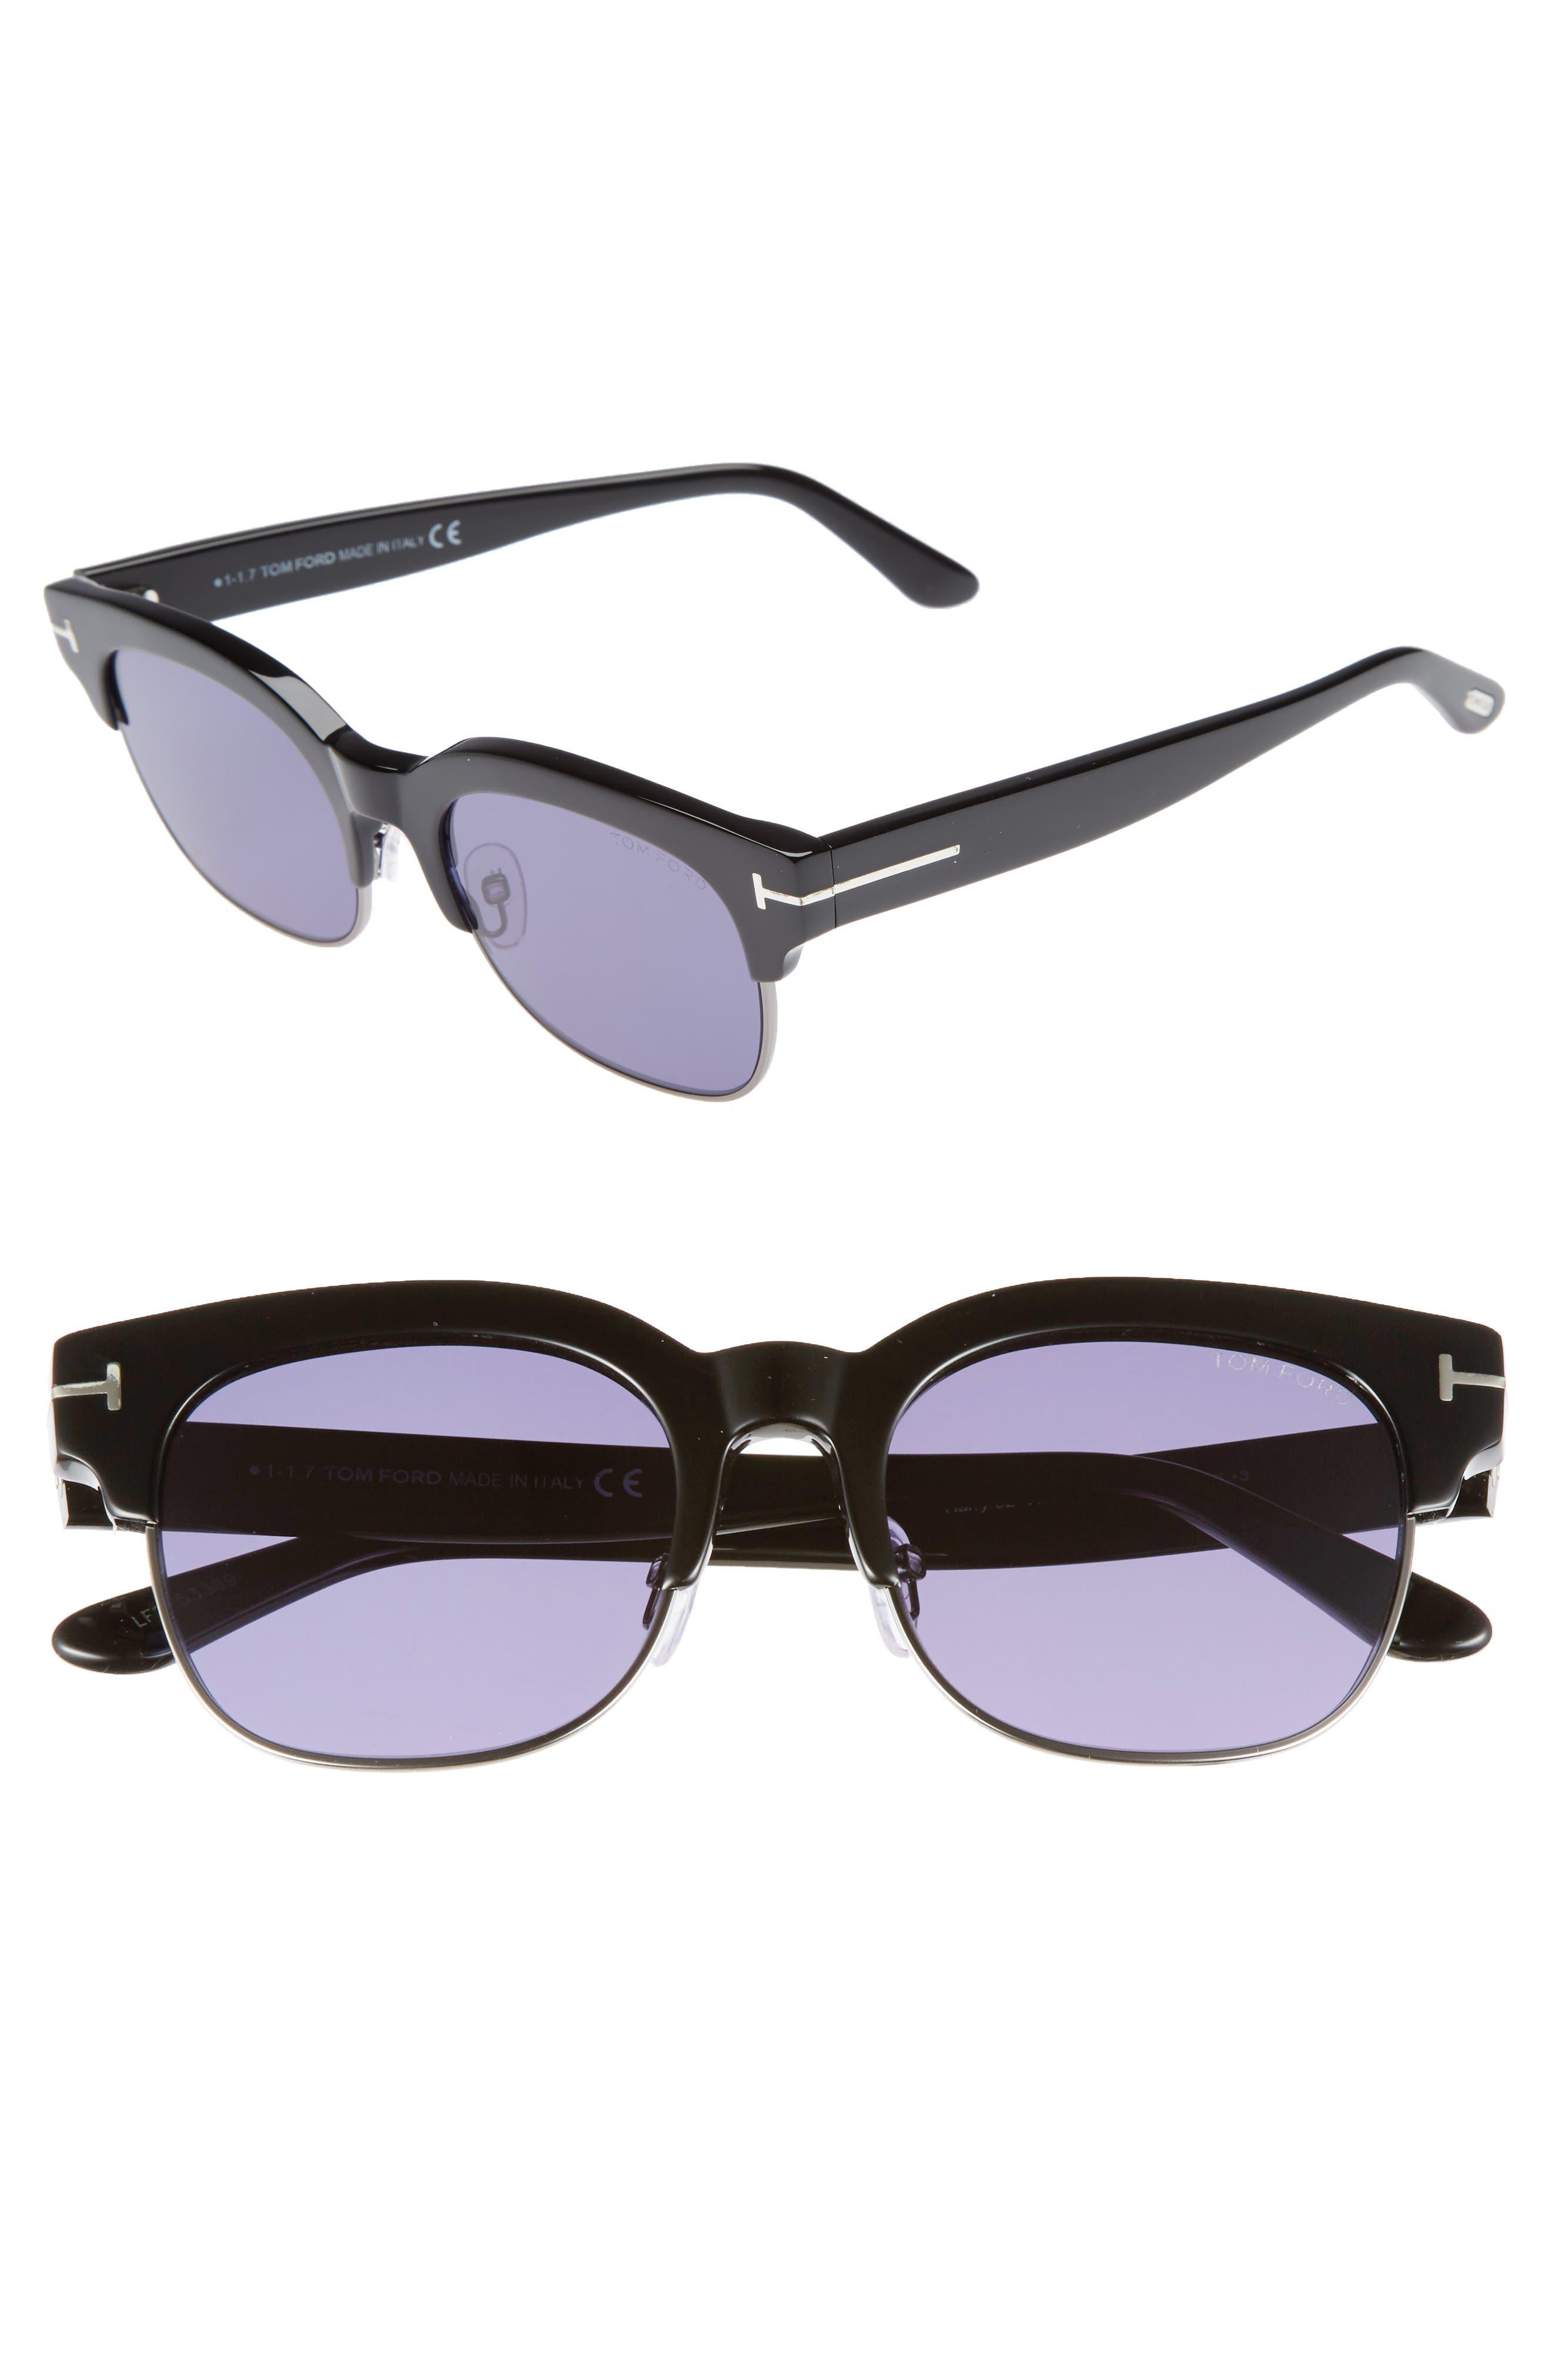 Harry 53mm Half-Rim Sunglasses,                             Main thumbnail 1, color,                             BLACK/ DARK RUTHENIUM/ BLUE